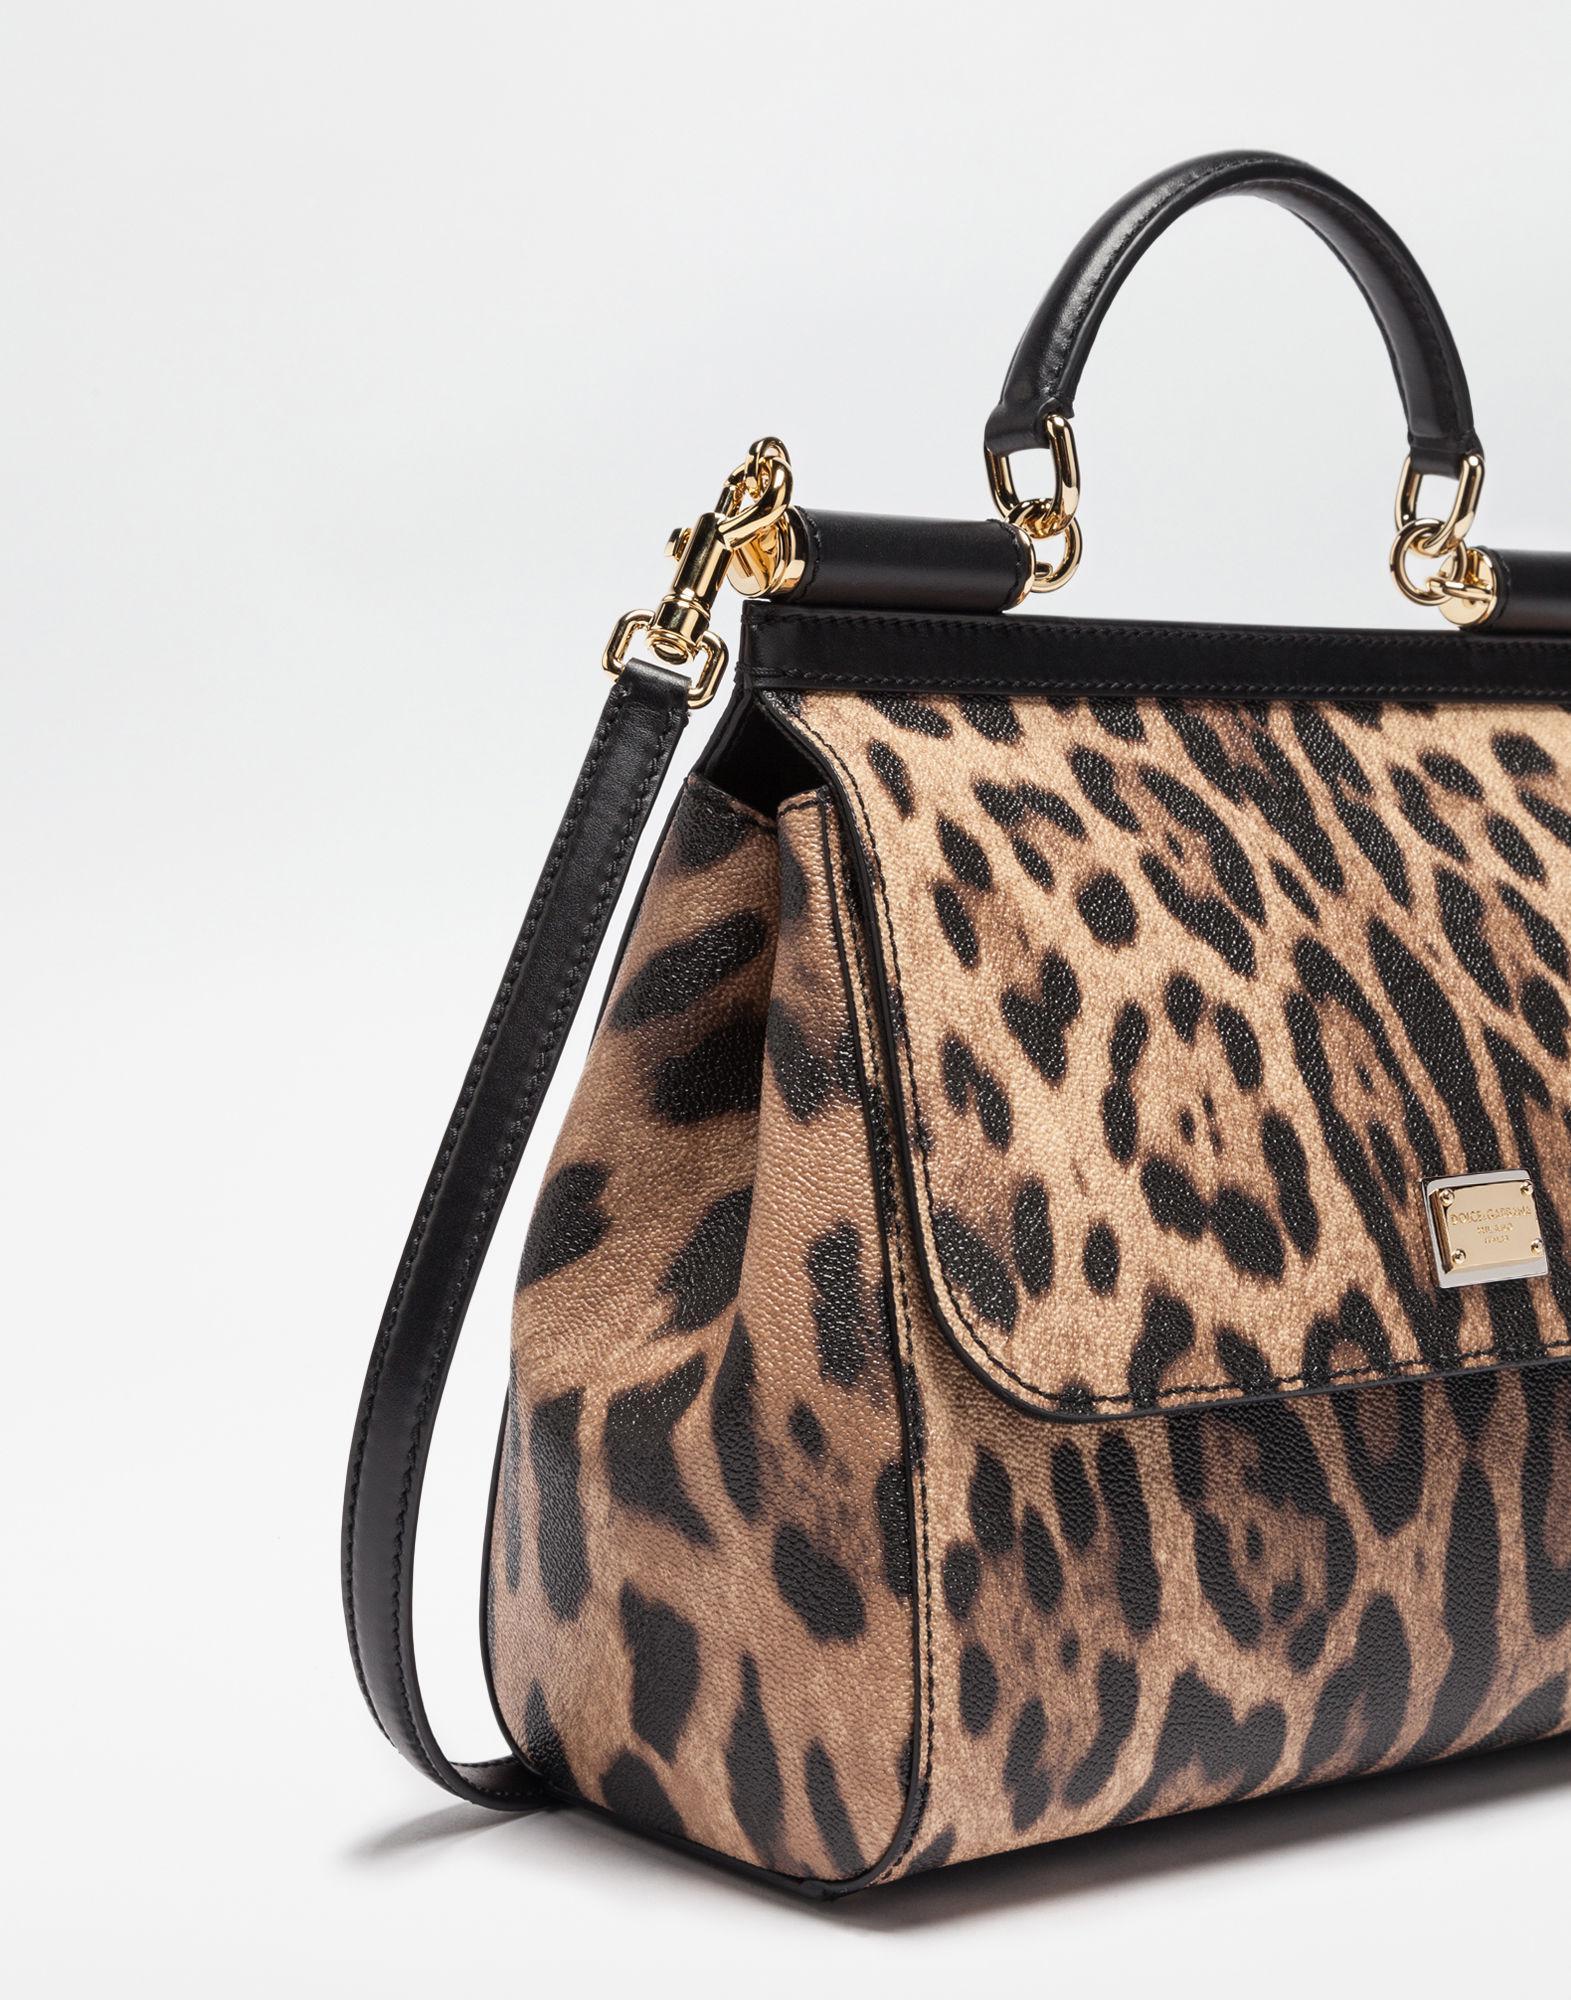 c9037efe99cf Lyst - Dolce   Gabbana Regular Sicily Bag In Leopard Textured Leather in  Brown - Save 22%